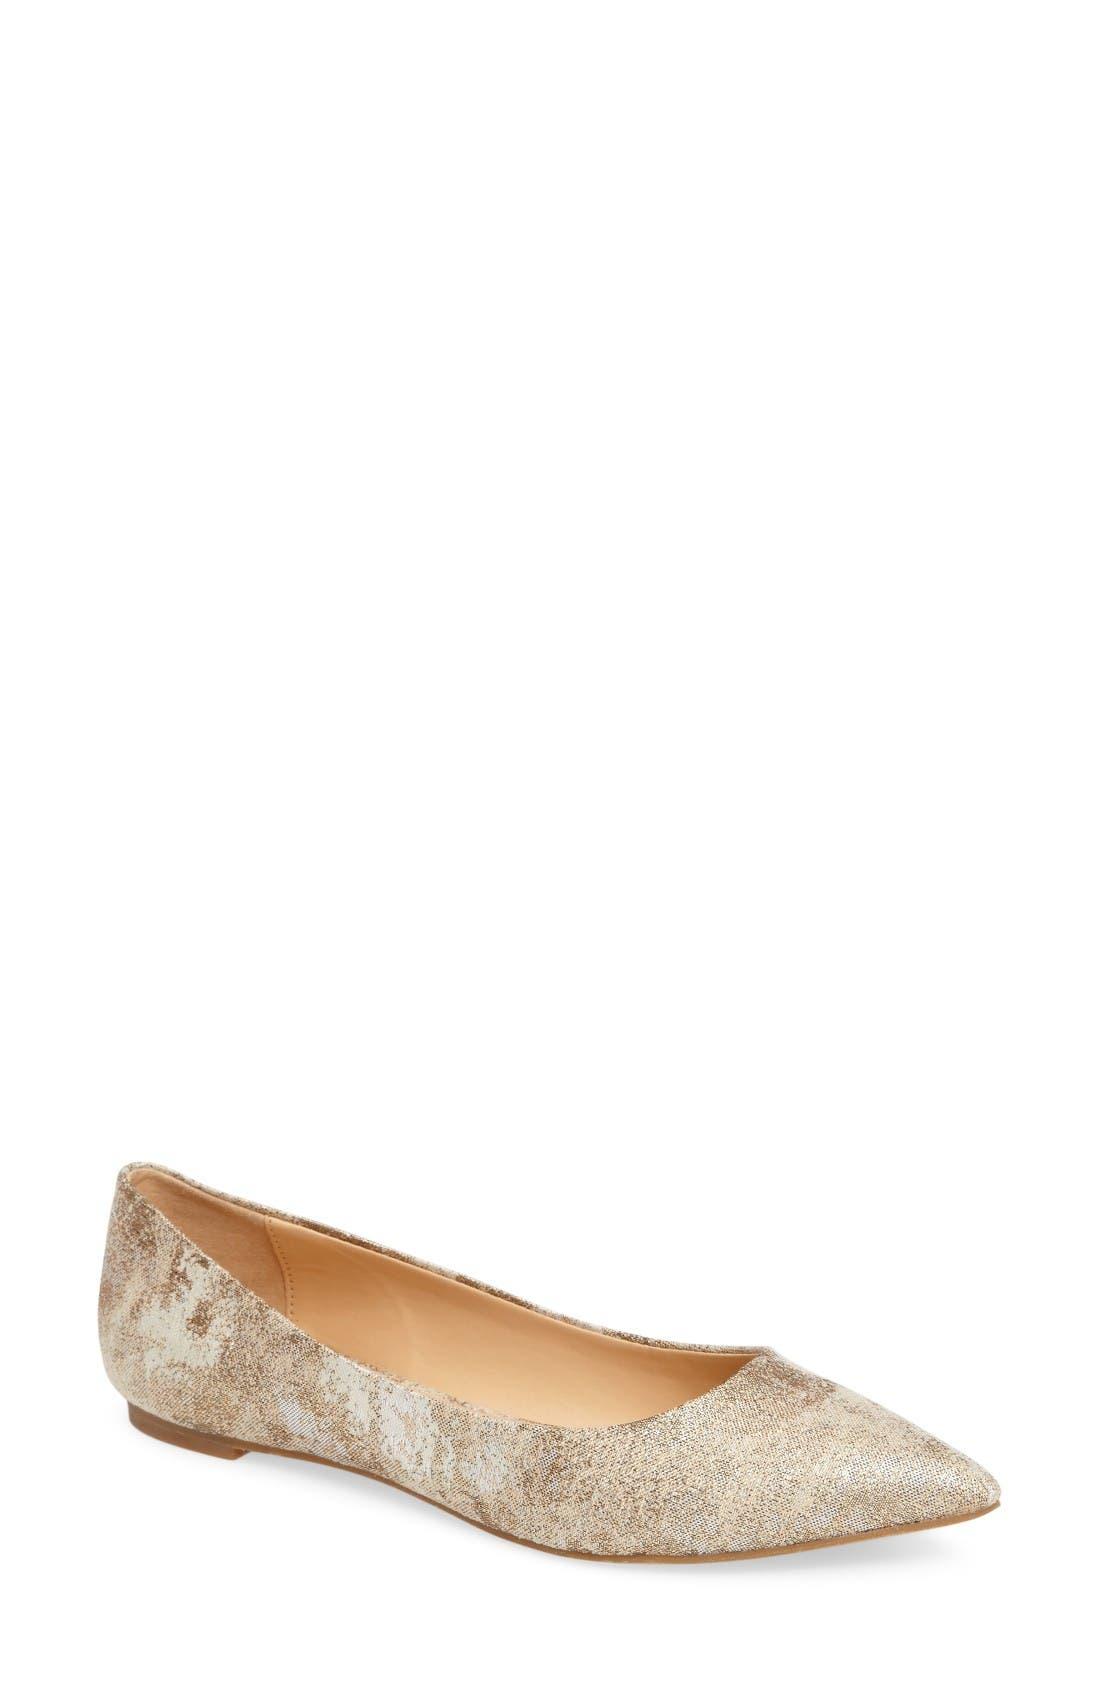 Daya by Zendaya Mystic Pointy Toe Flat (Women)